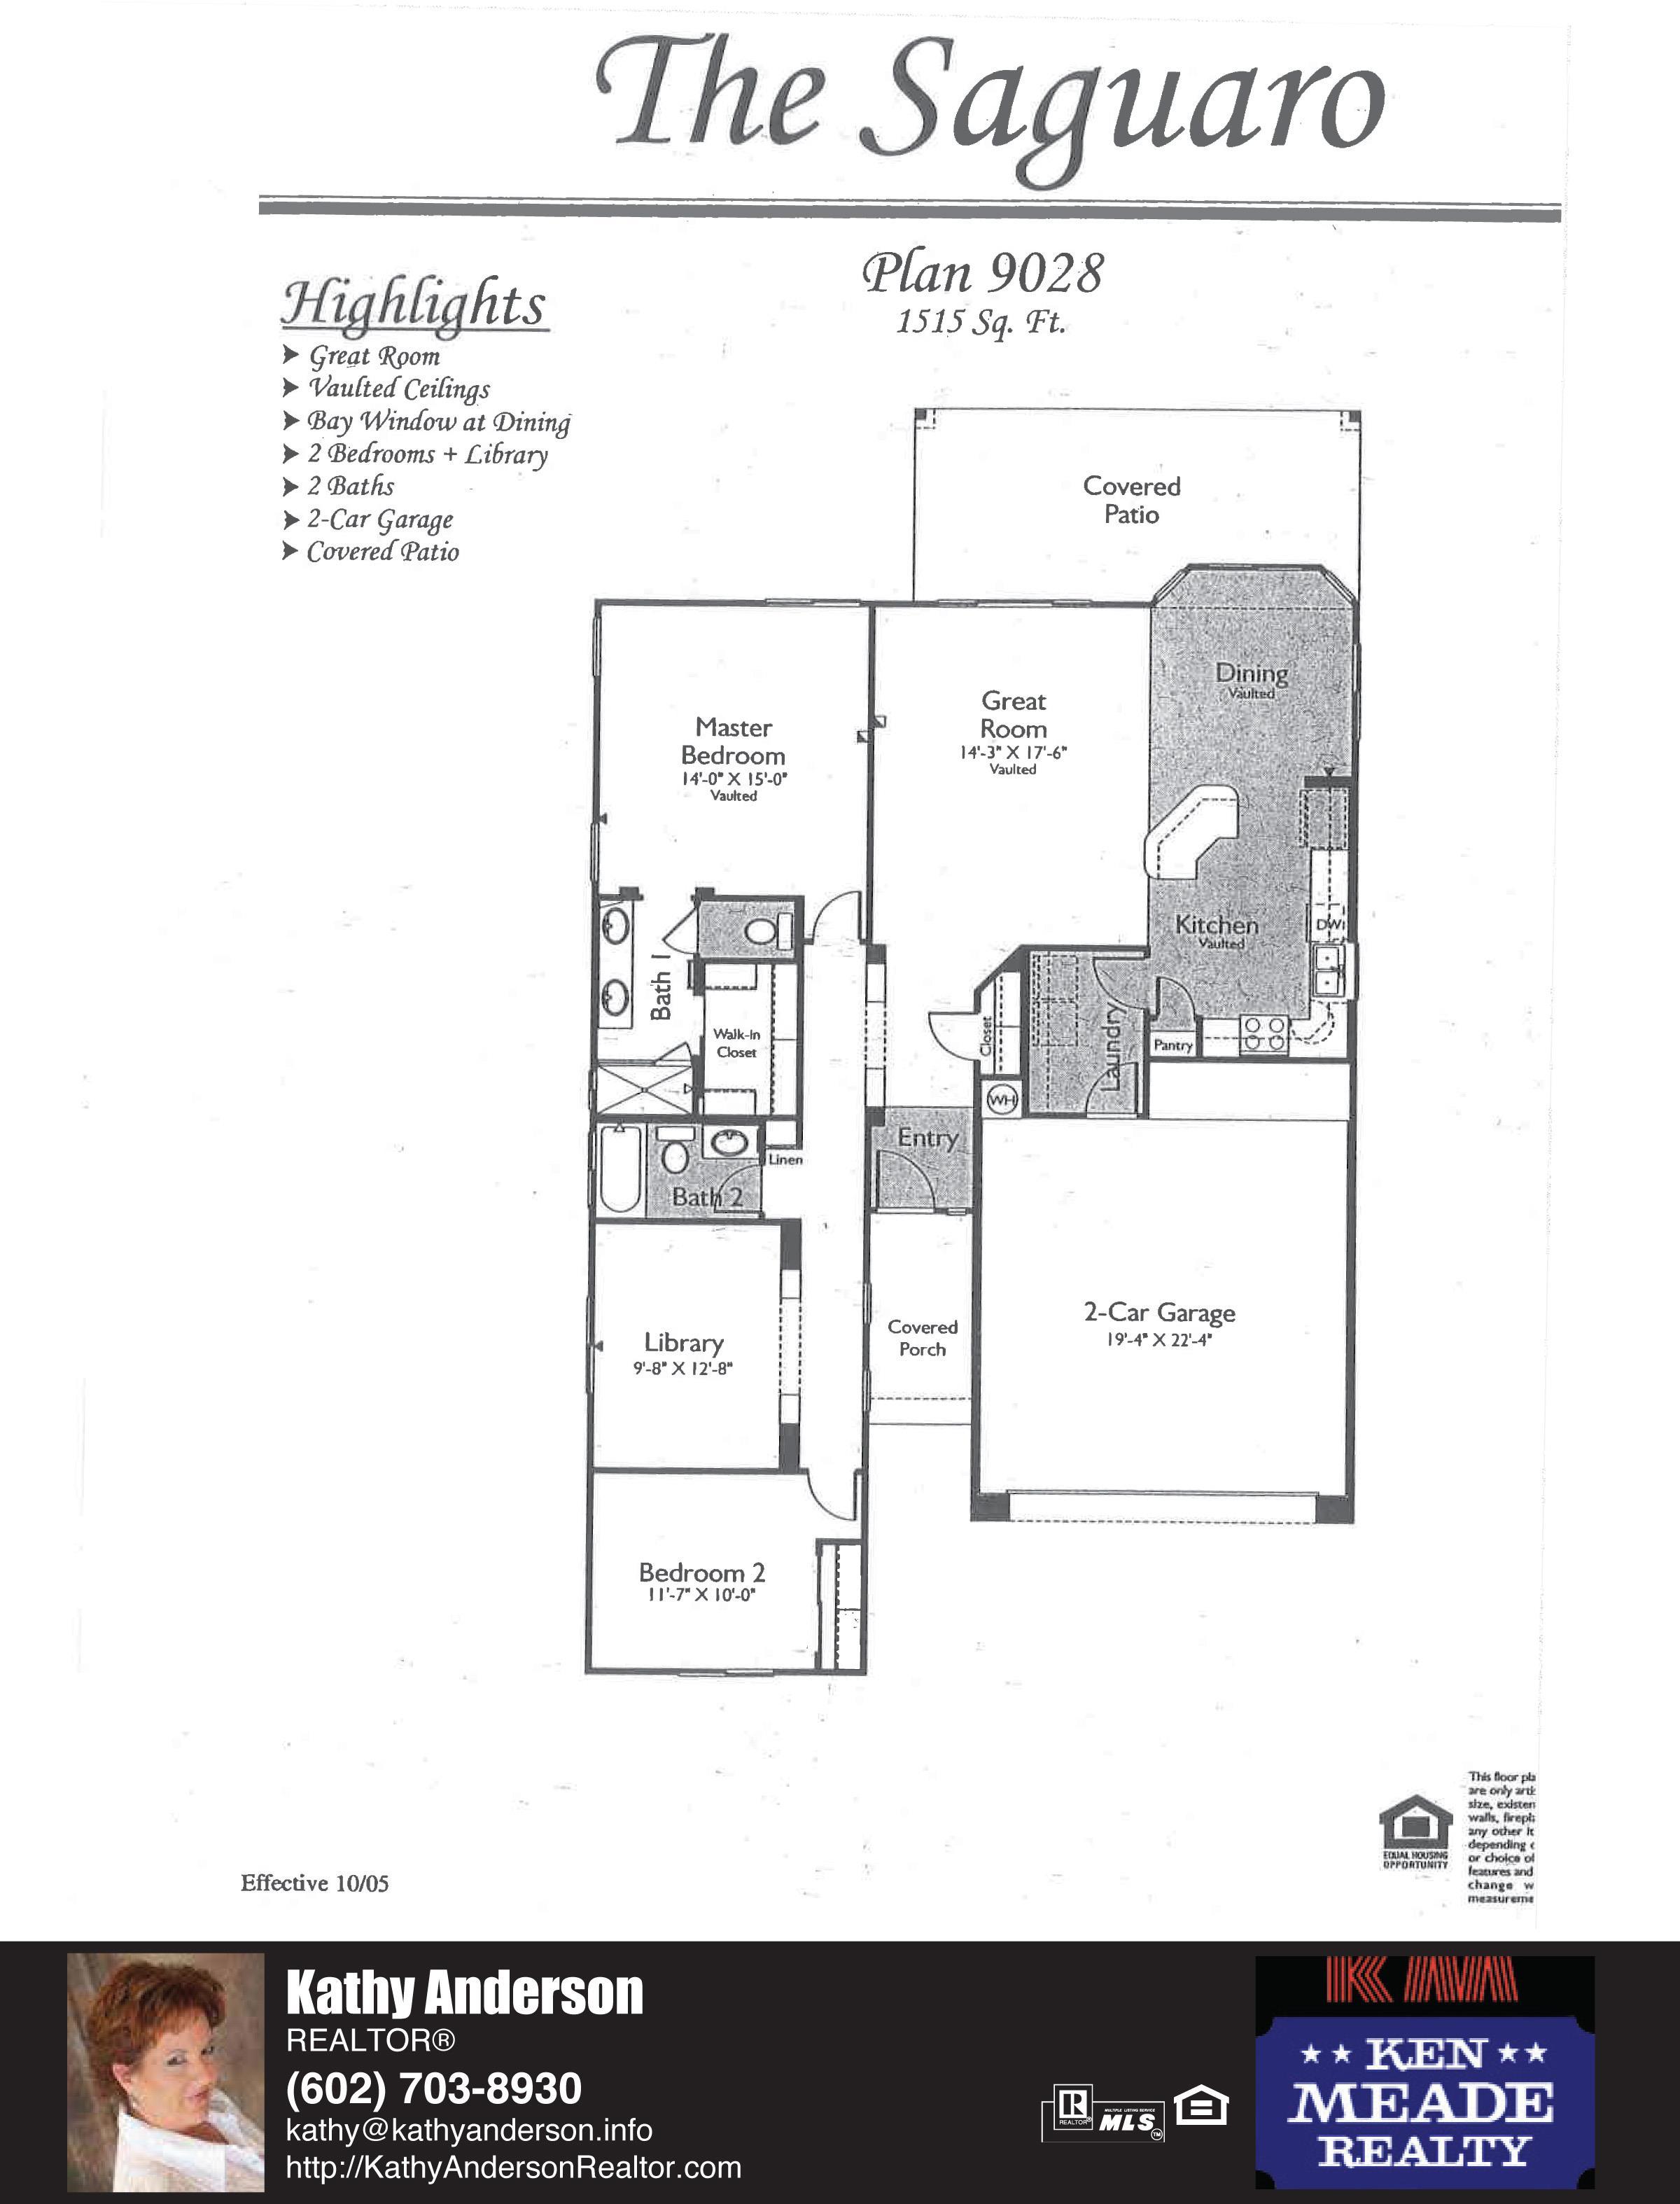 Arizona Traditions Saguaro Floor Plan Model Home Plans Floorplans Models in Surprise Arizona AZ Top Ken Meade Realty Realtor agent Kathy Anderson